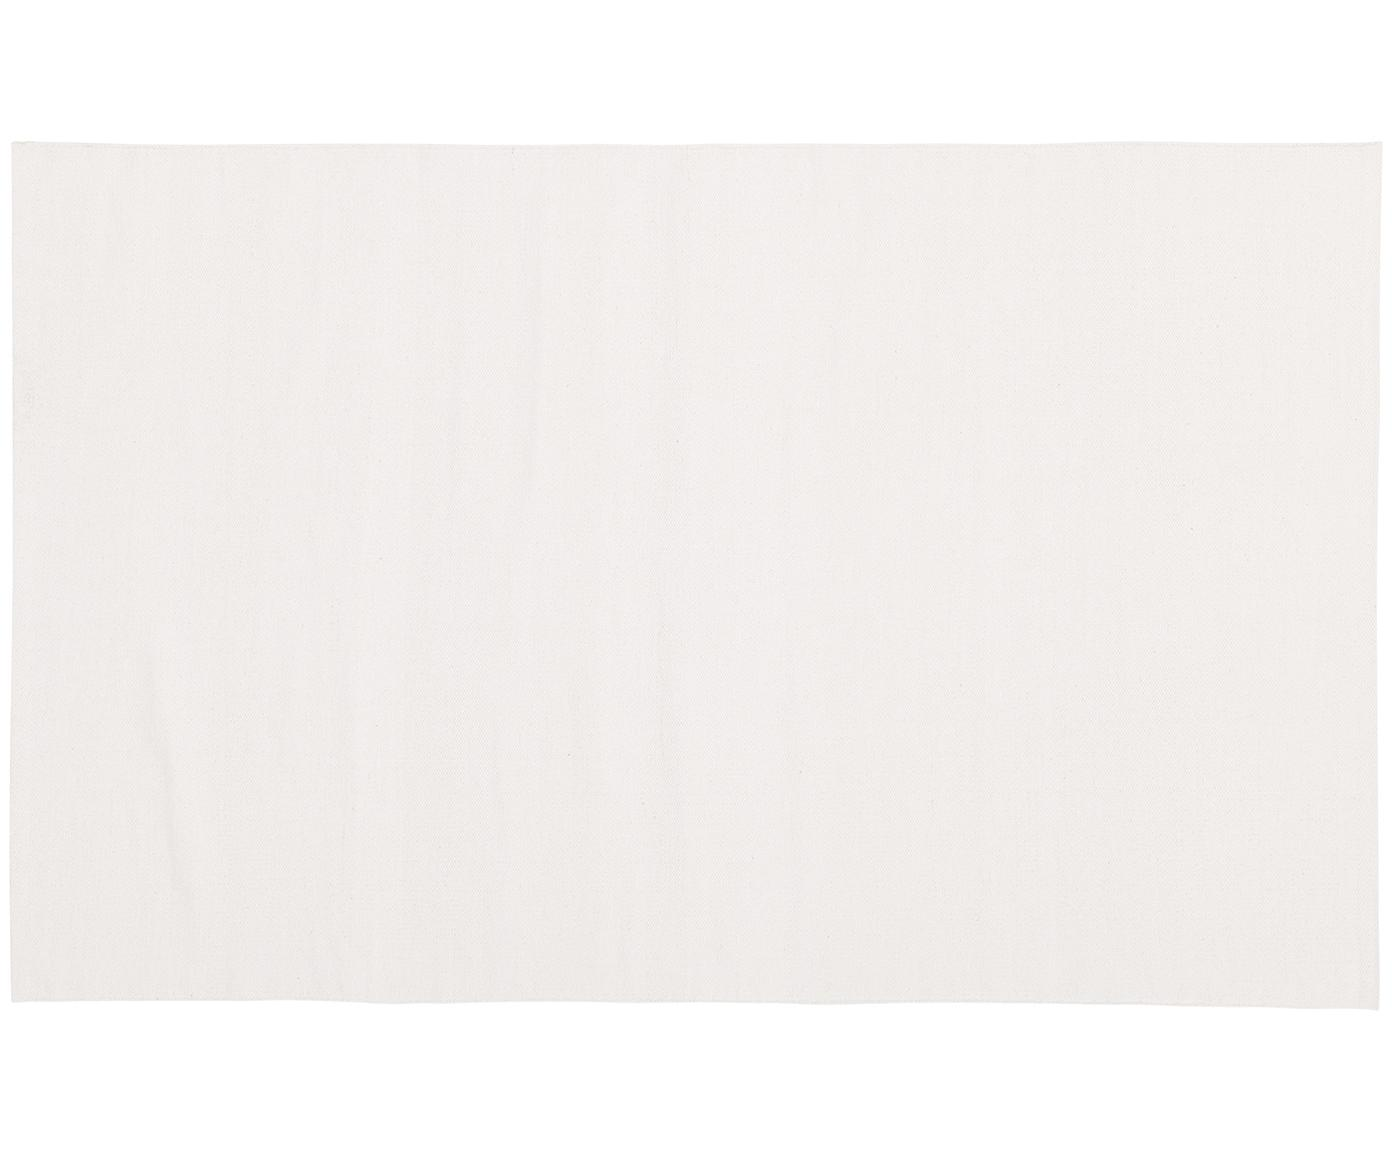 Dun handgeweven katoenen vloerkleed Agneta, Katoen, Crèmewit, B 50 x L 80 cm (maat XXS)